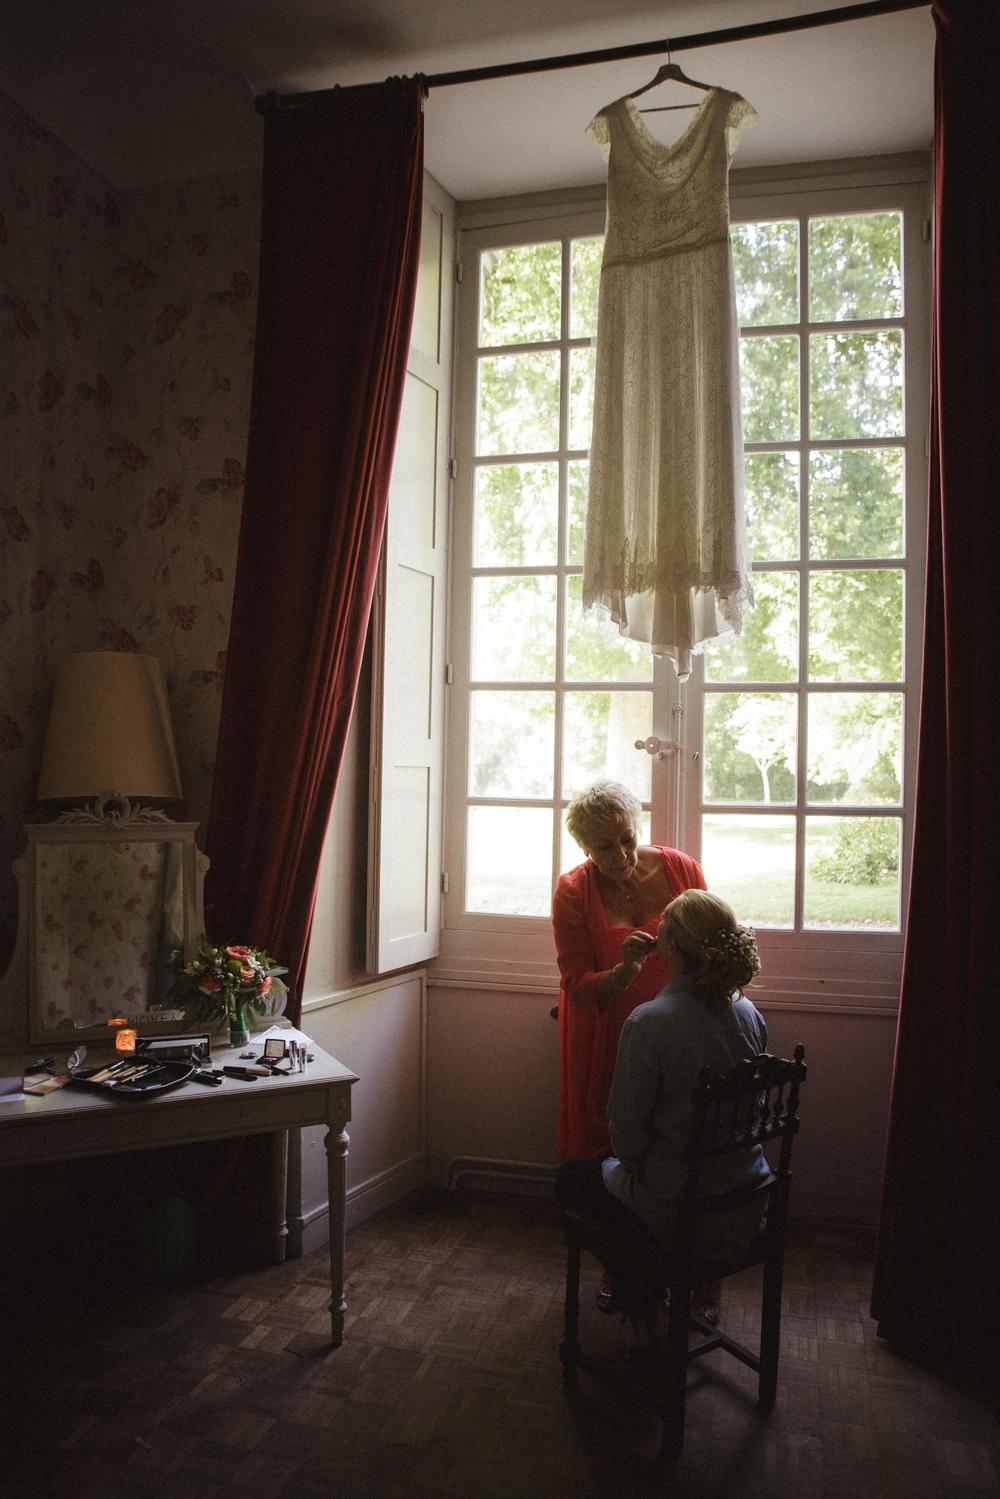 02-La Femme Gribouillage-mariage champetre Longpont (1).jpg